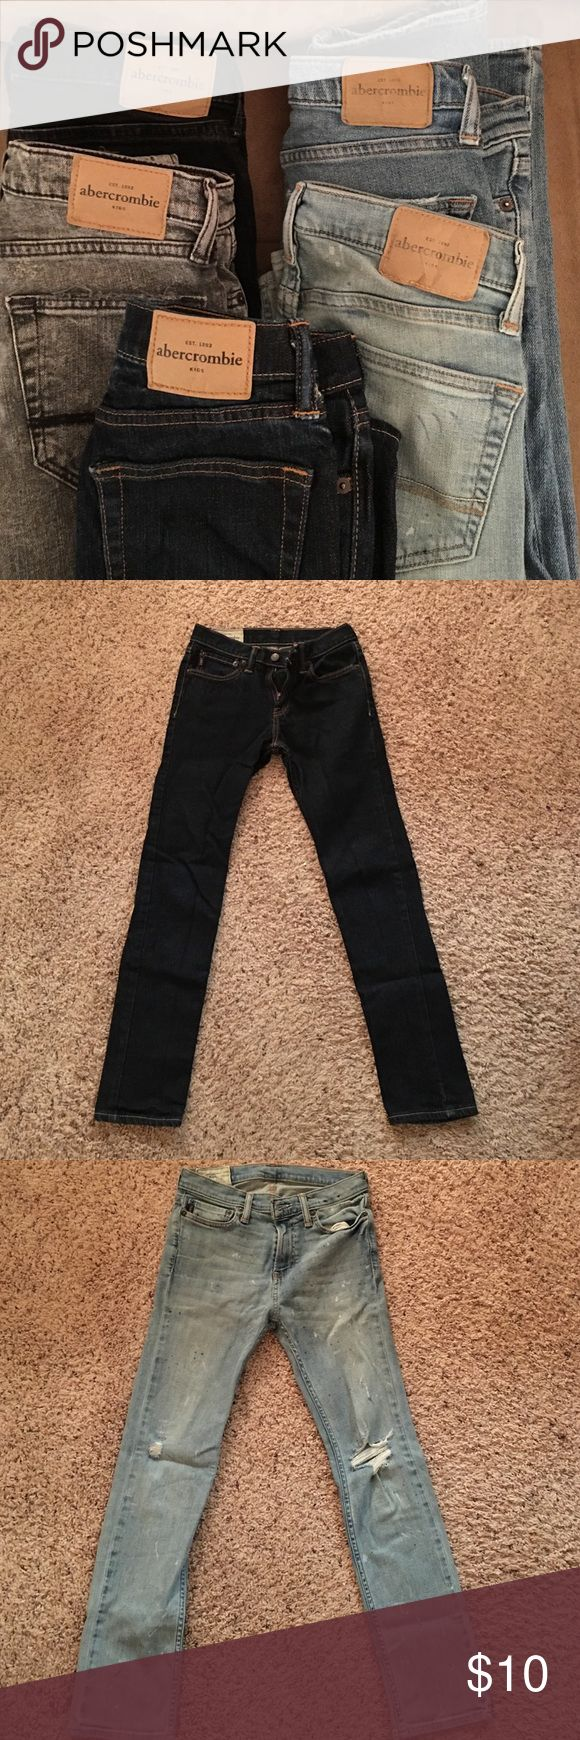 Abercrombie kid jeans Boys size 14 abercrombie kids Bottoms Jeans